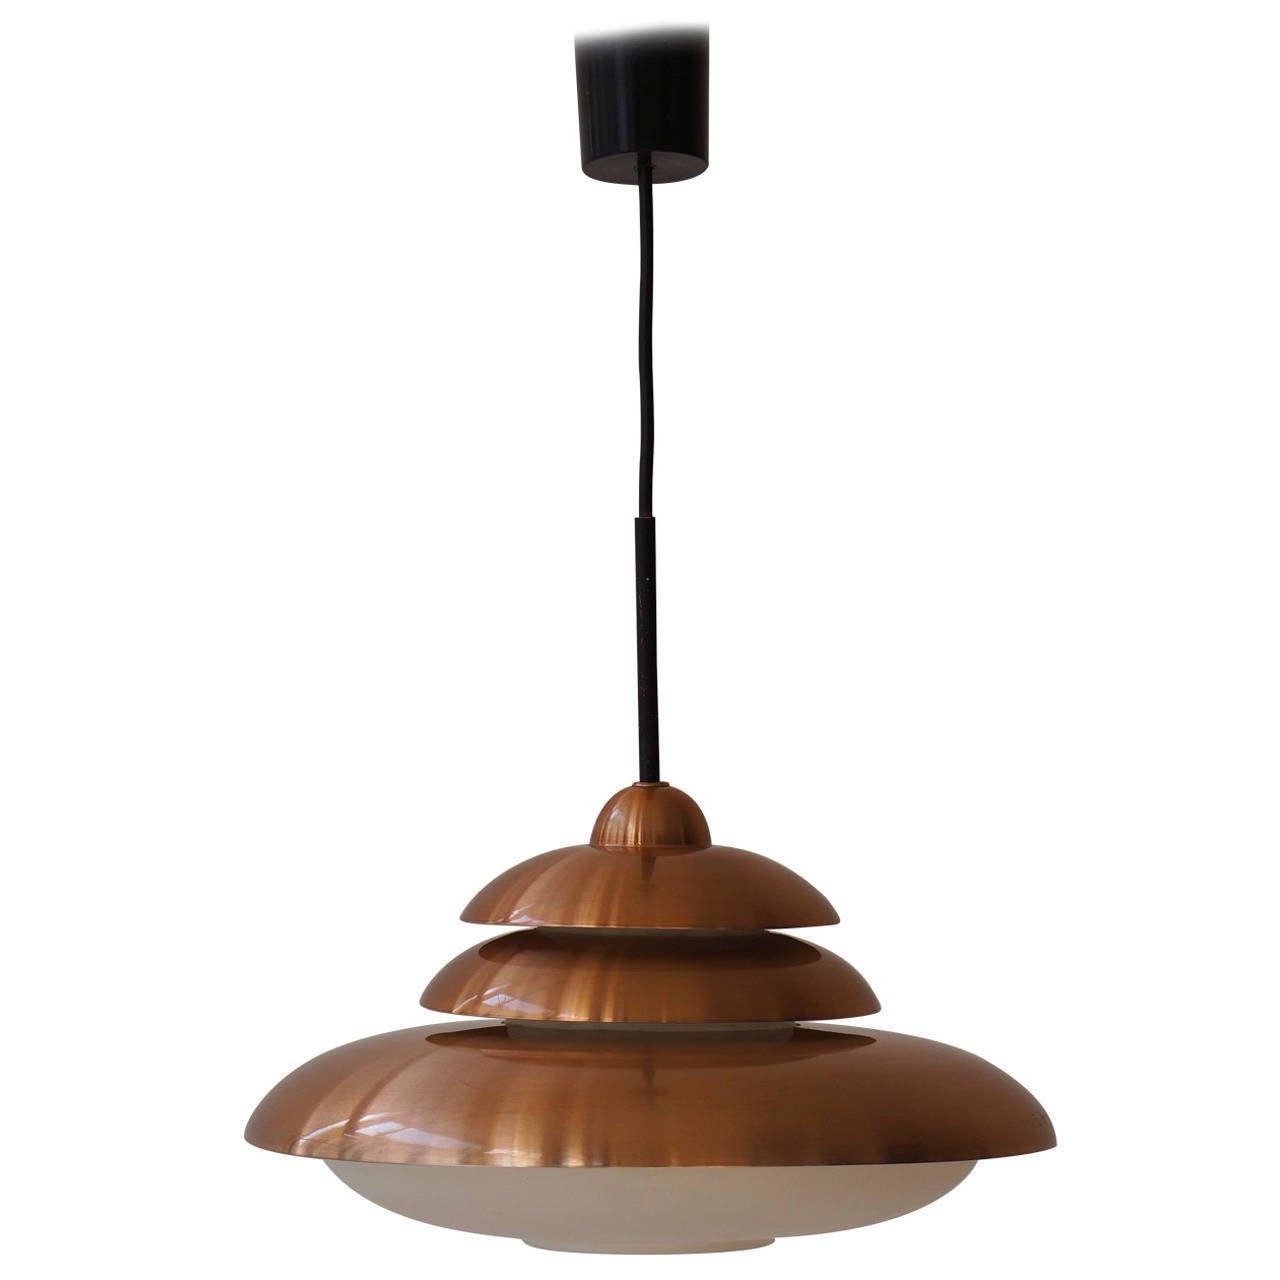 Doria opaline and copper pendant light.